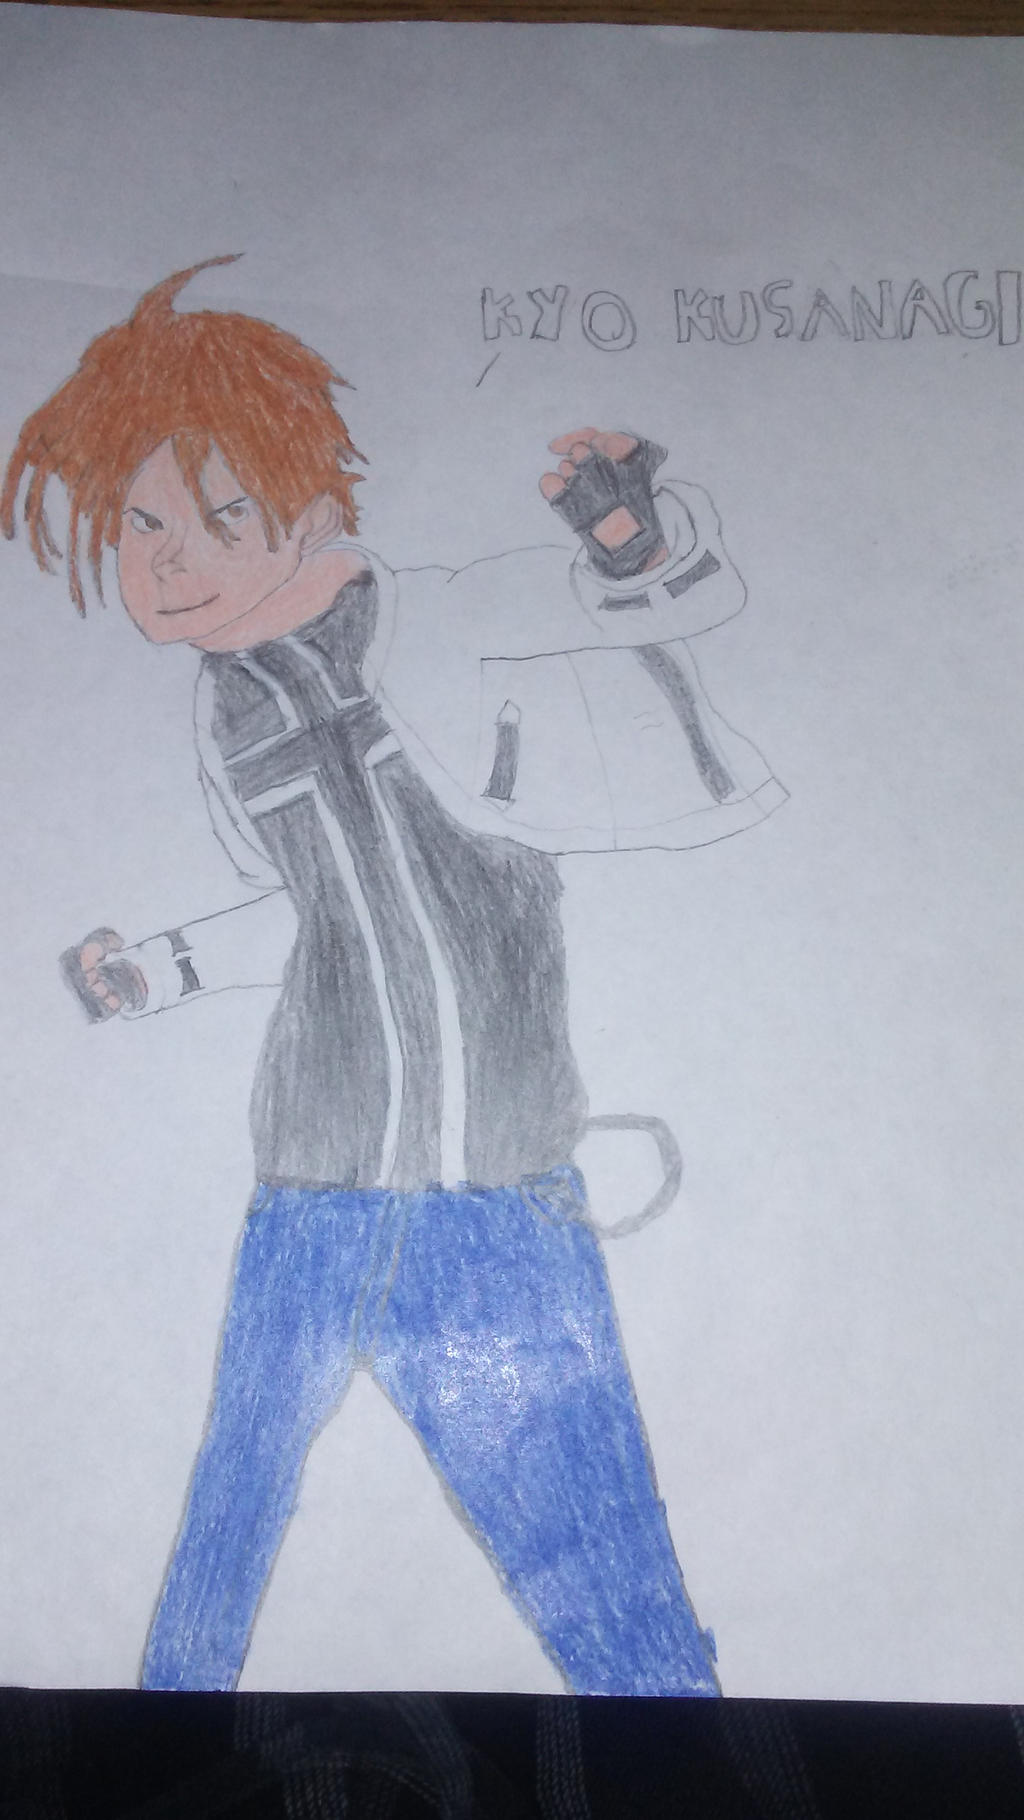 King of Fighters - Kyo Kusanagi Drawing attempt by BeastmodeGuNs